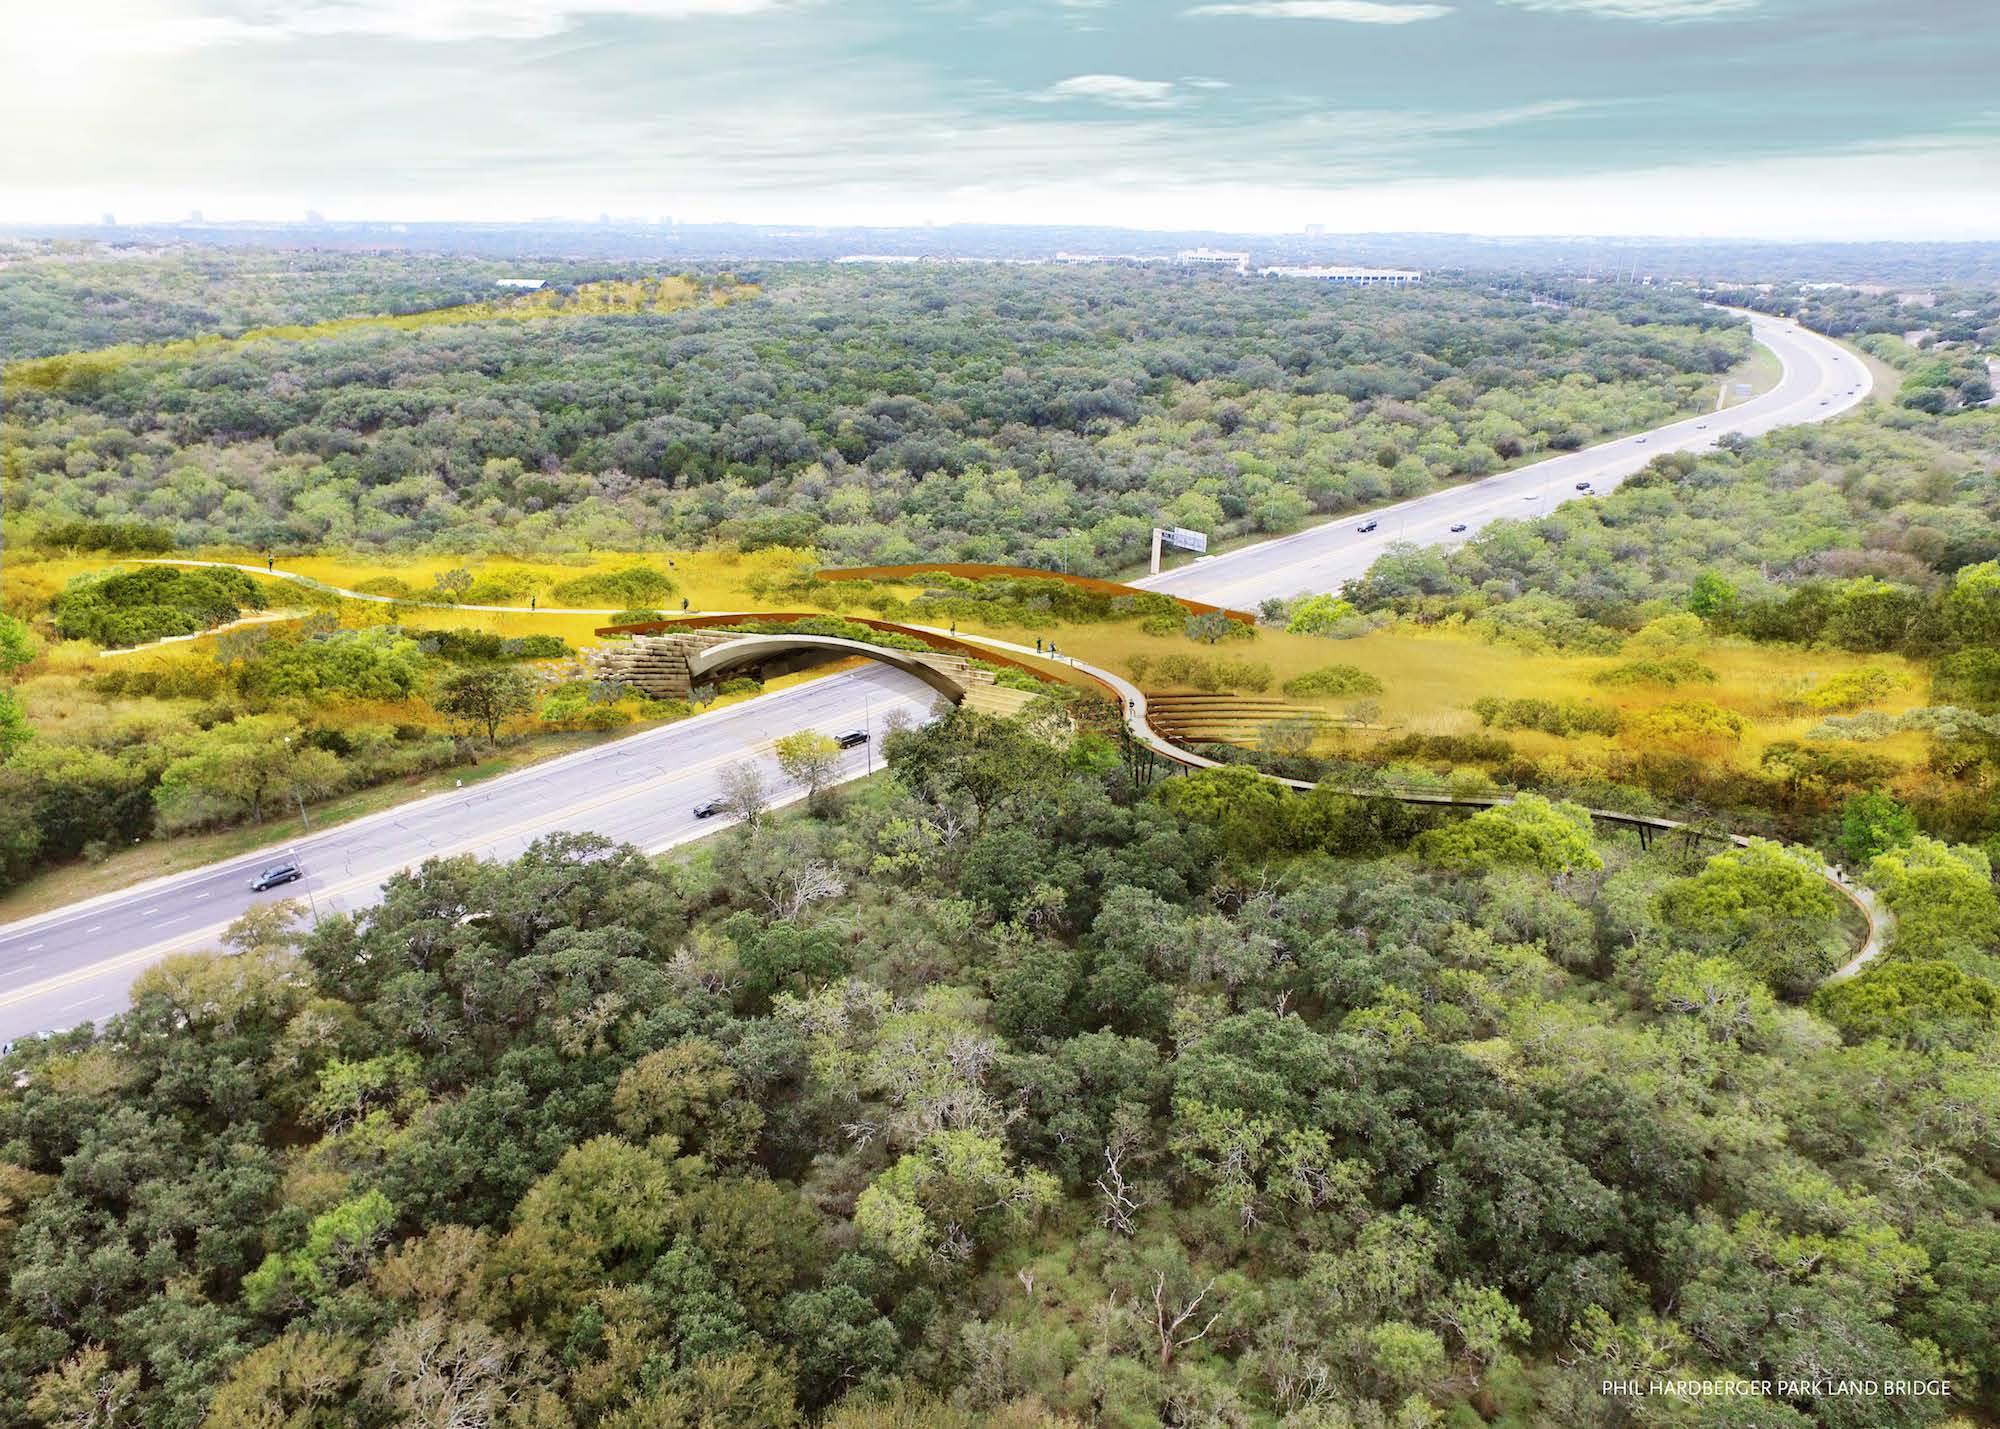 The Phil Hardberger Park land bridge will be 150-feet wide.